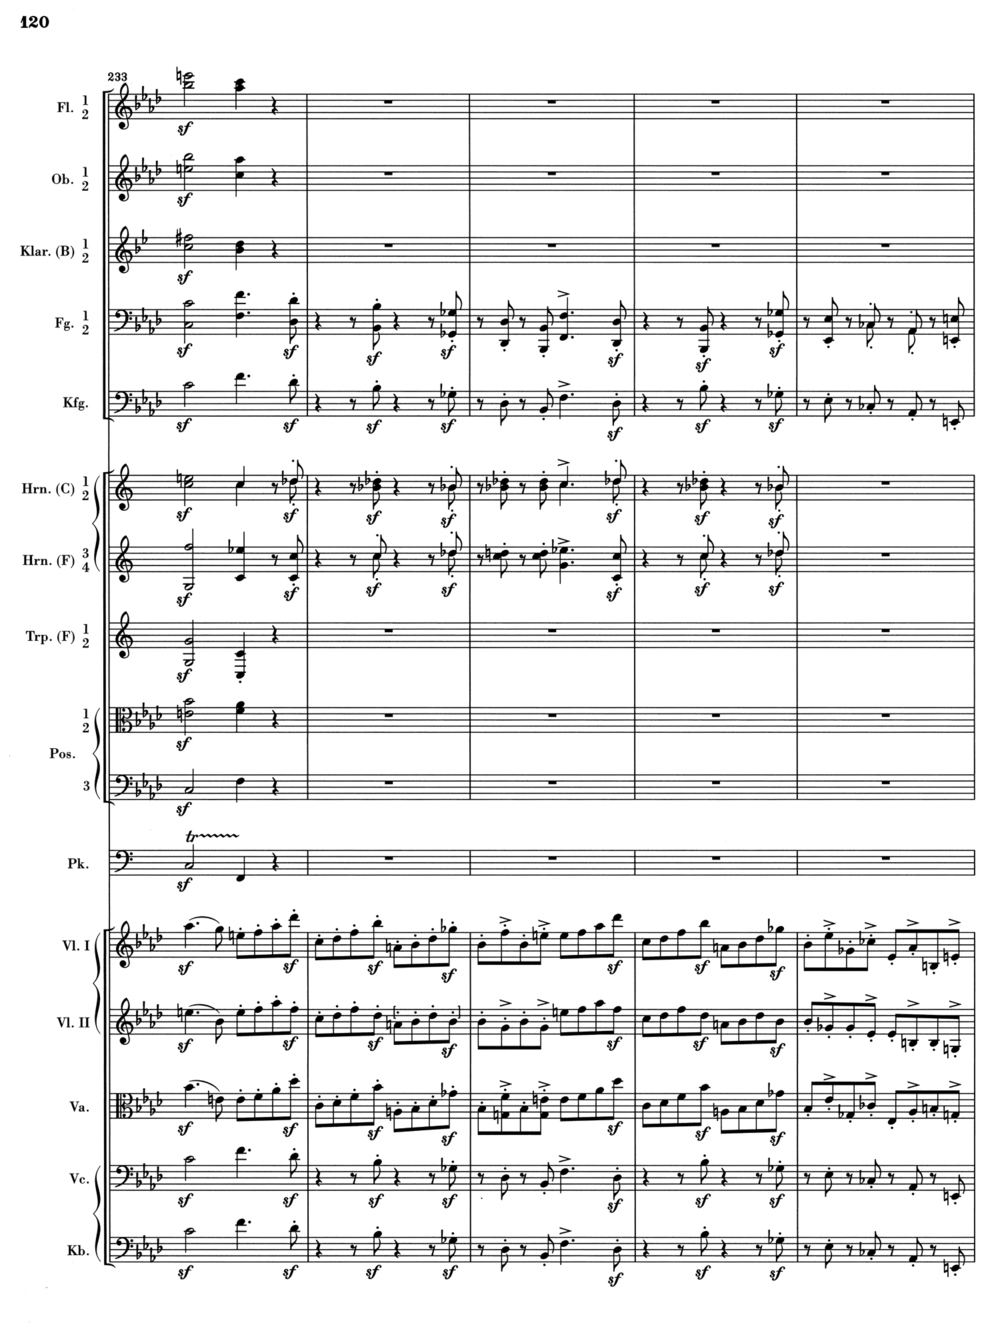 Brahms 3 Score 13.jpg